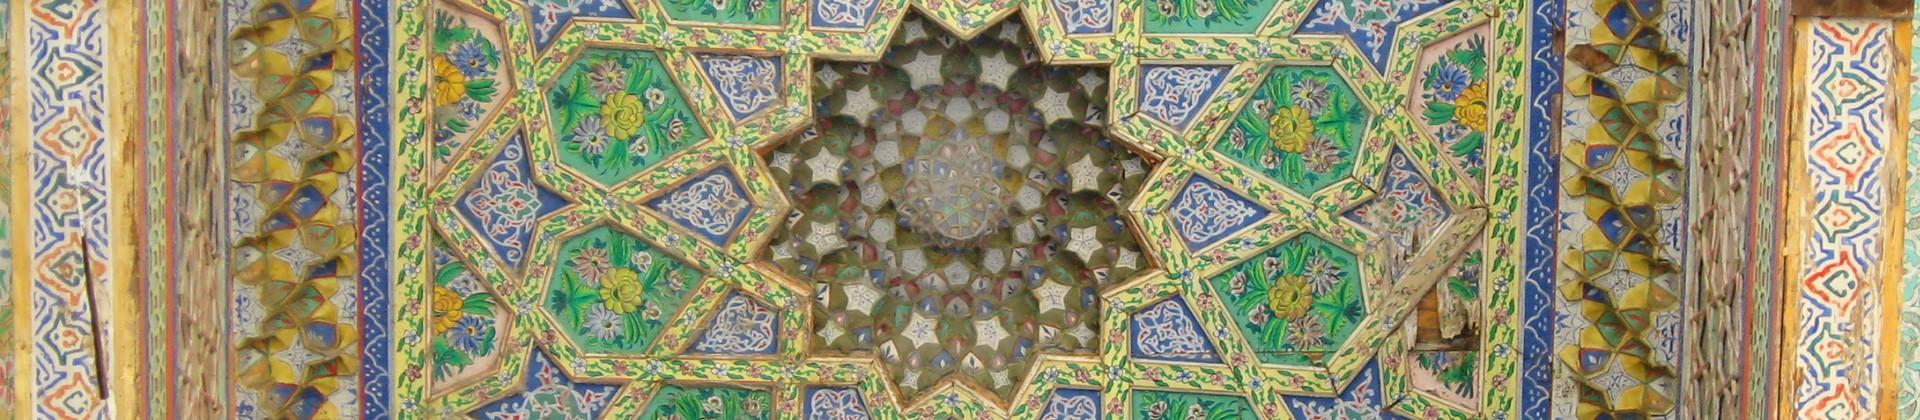 Bolo Haouz Mosque - 1